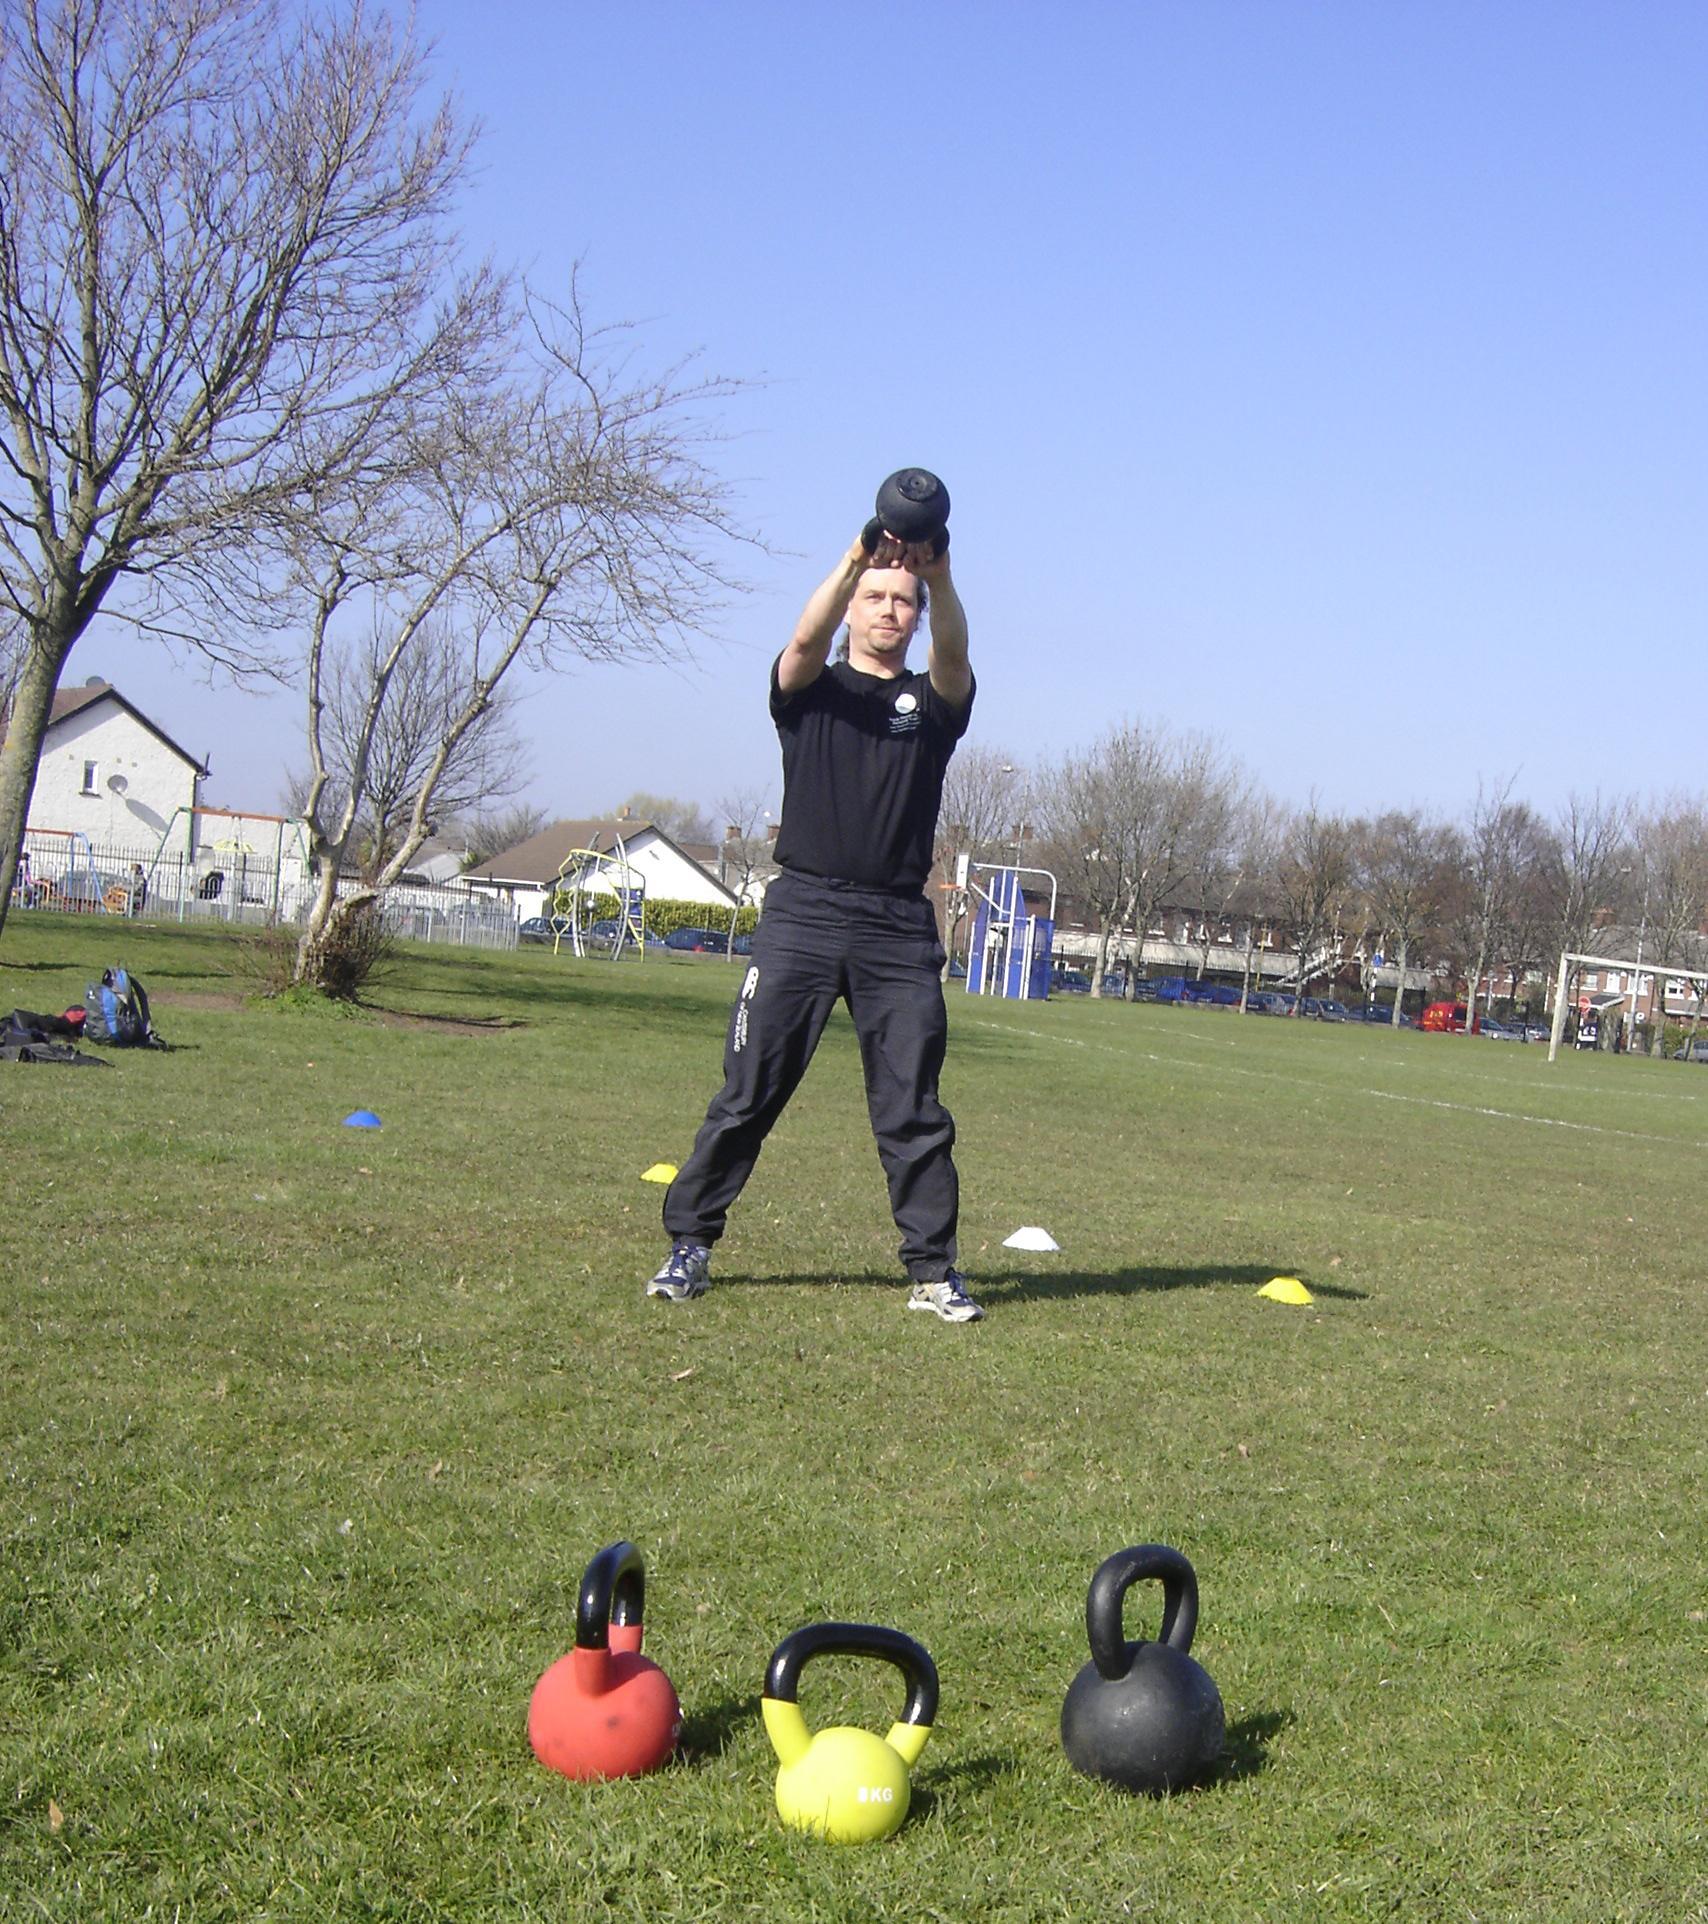 Pilates Classes & Toning, Weight Loss